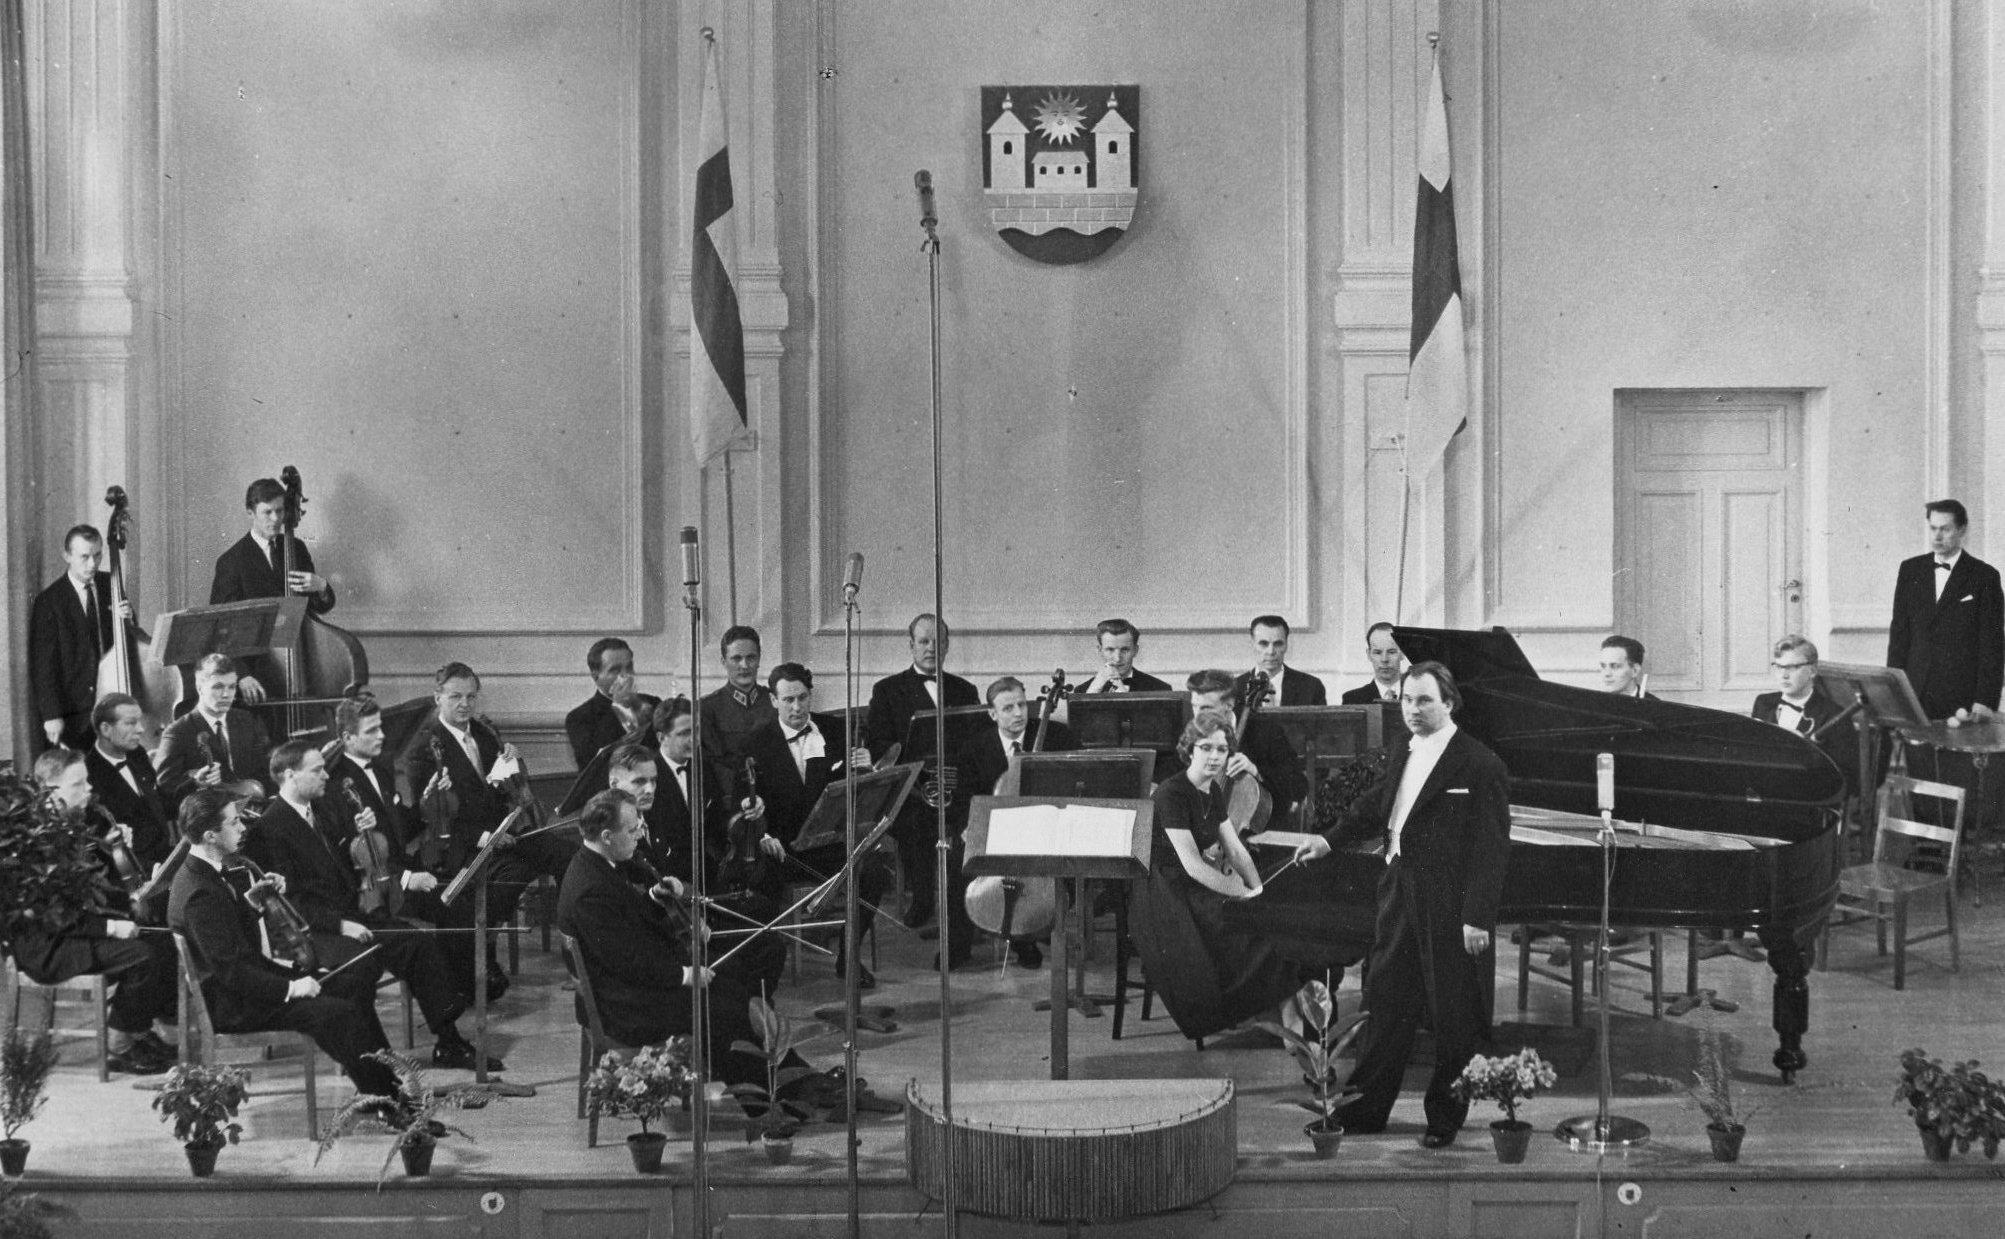 Hämeenlinnan kaupunginorkesteri